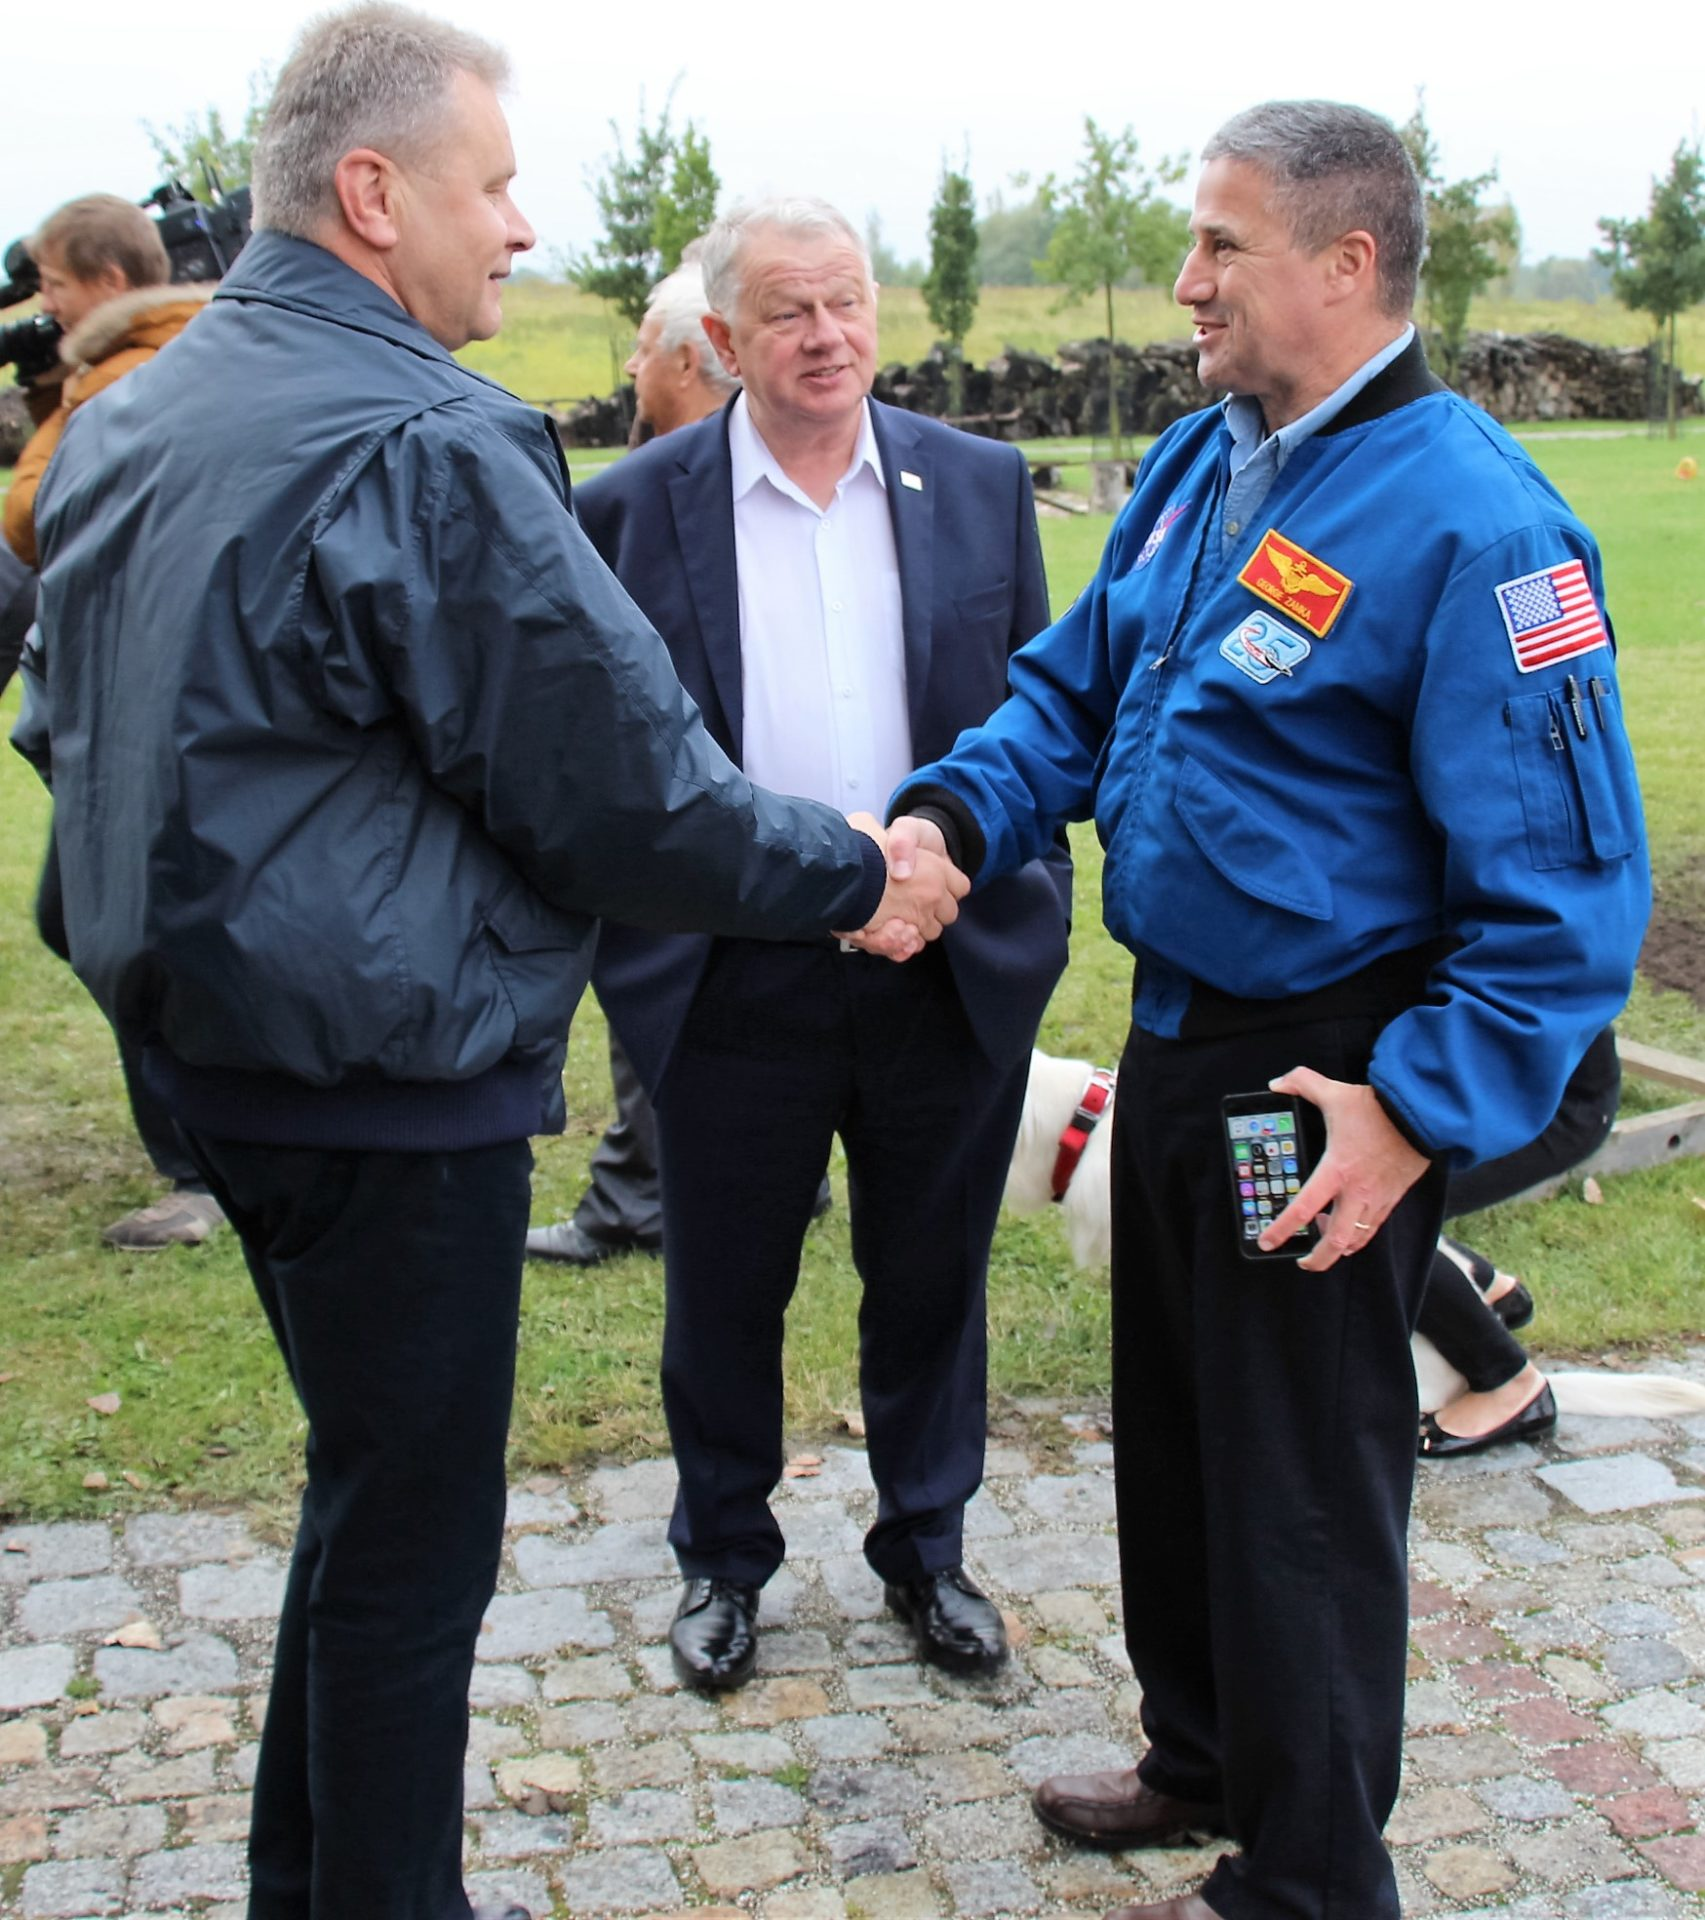 general-ryszard-hac-adam-bisek-i-amerykanski-astronauta-george-zamka-wkopanie-debu-wroclaw